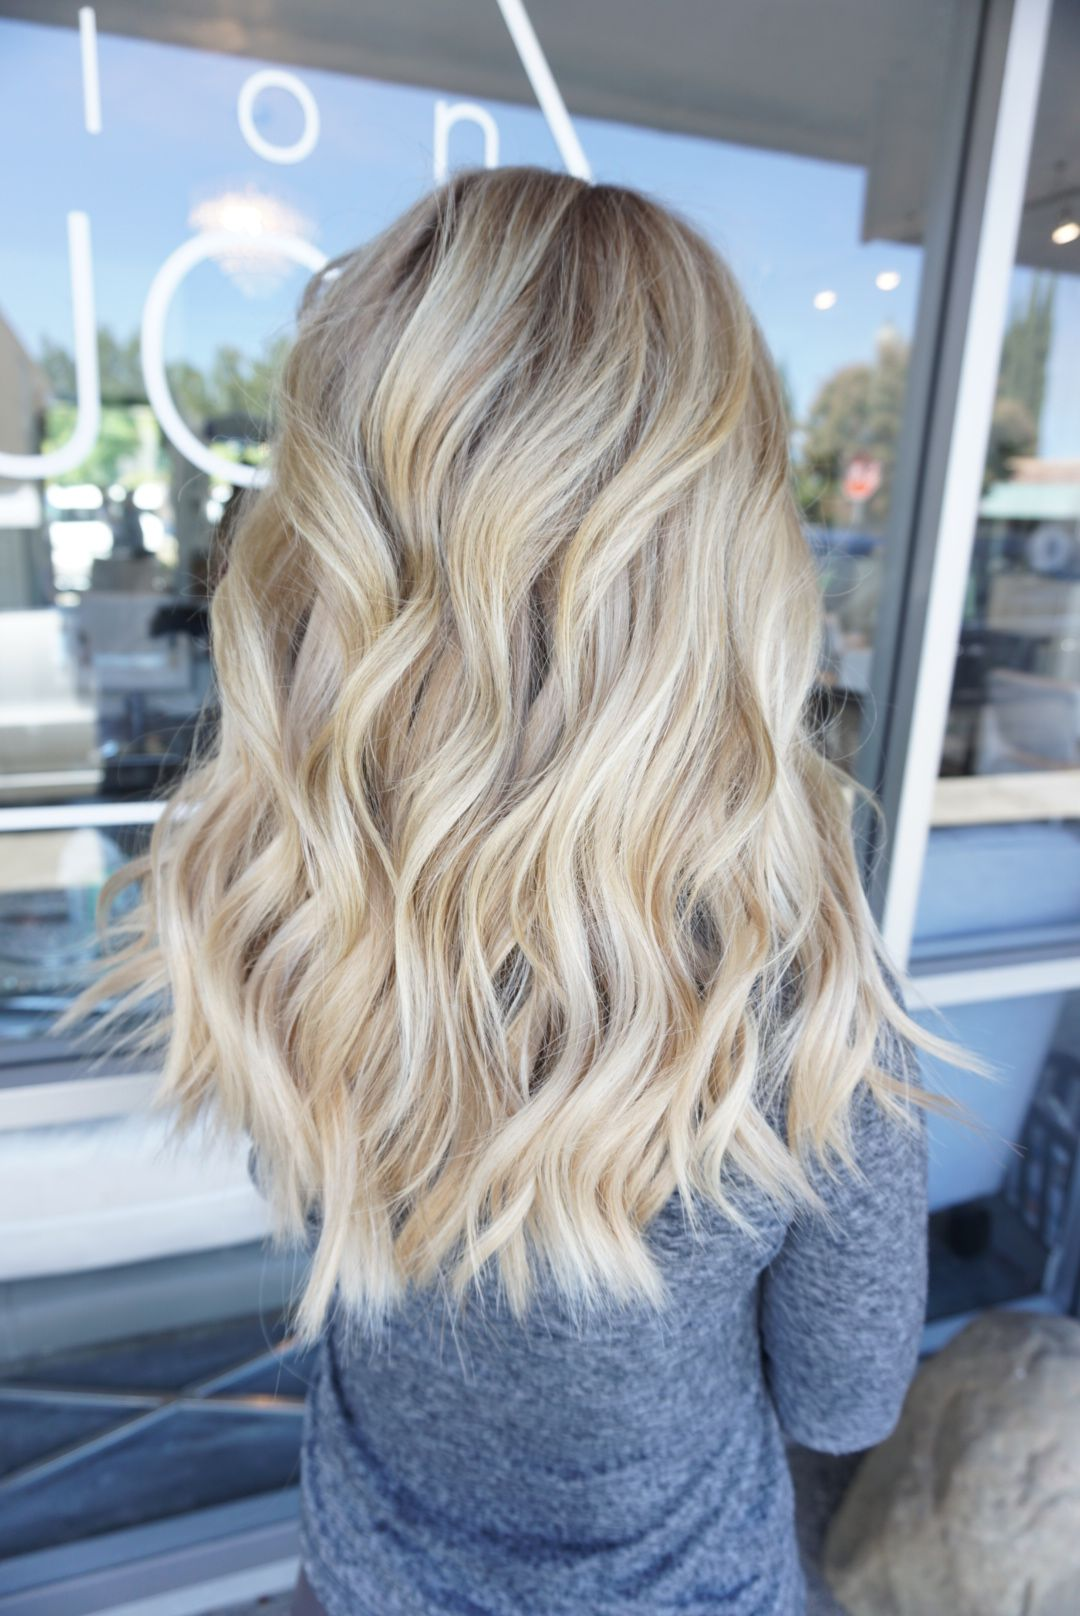 Blonde NBR hair extensions Nbr extensions, Long hair